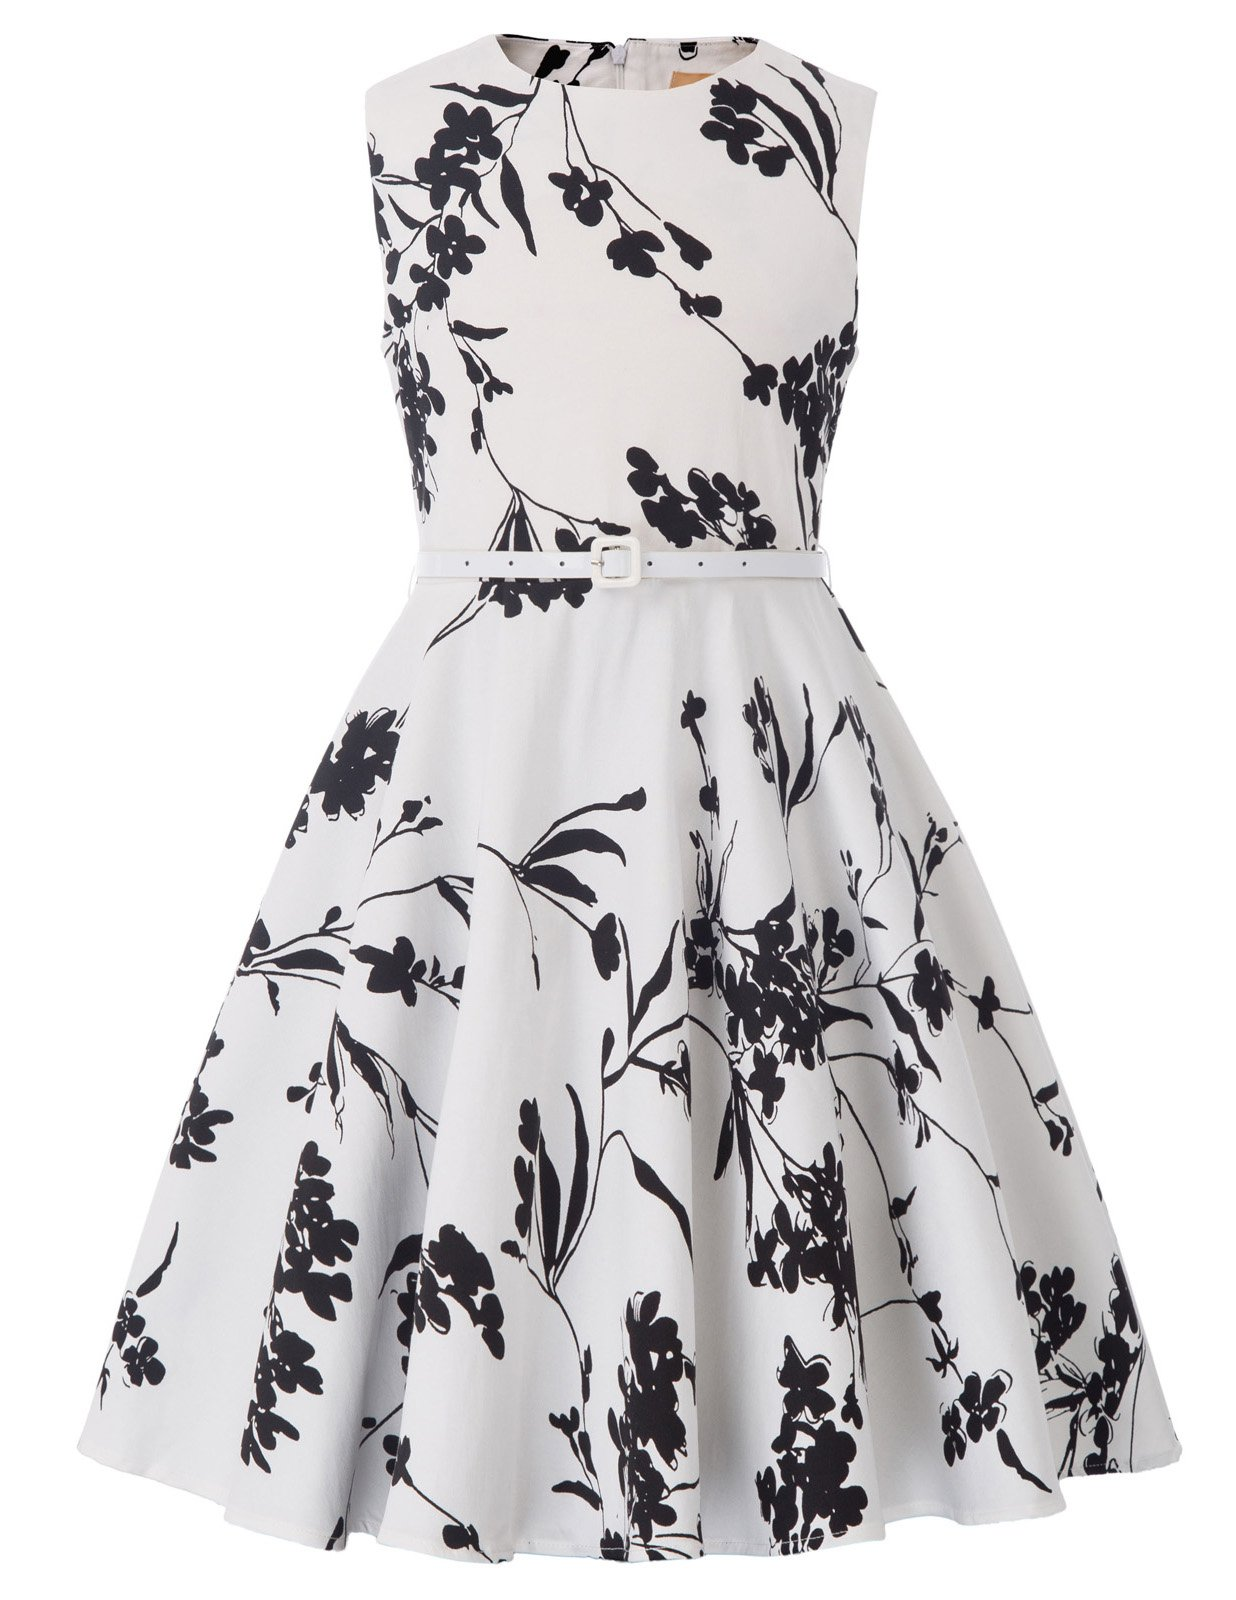 Kate Kasin Sleeveless Cotton Country Flower Summer Casual Dress for Toddler Girls 8-9yrs K250-25